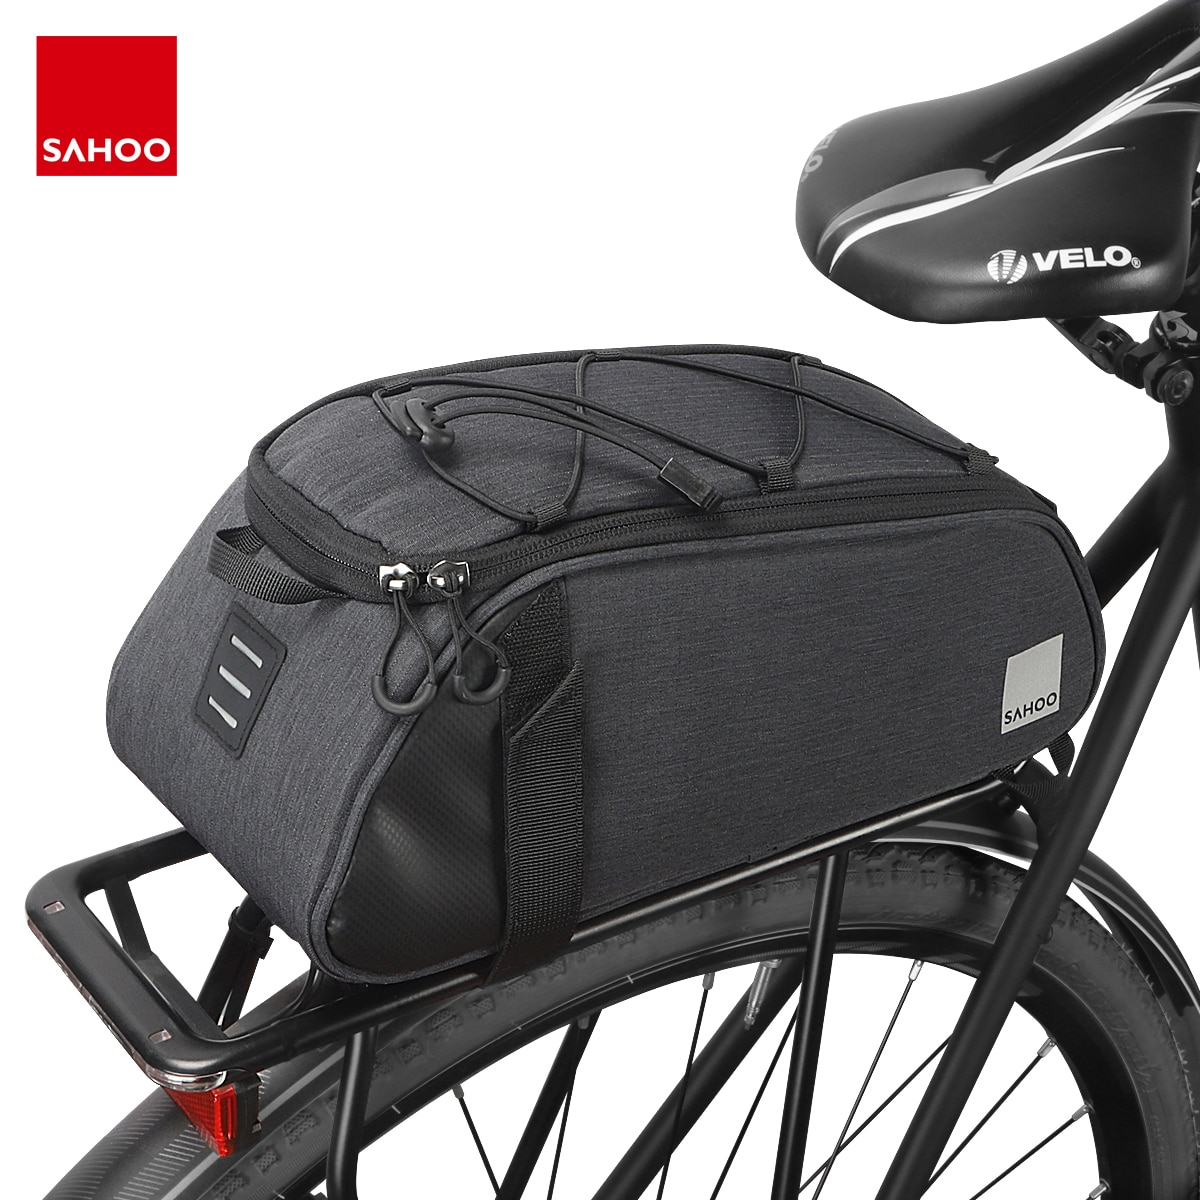 Sahoo 141465-SA bicicleta de montaña, bicicleta, bicicleta, portaequipajes del asiento trasero, bolsa de maletero, bolso de hombro